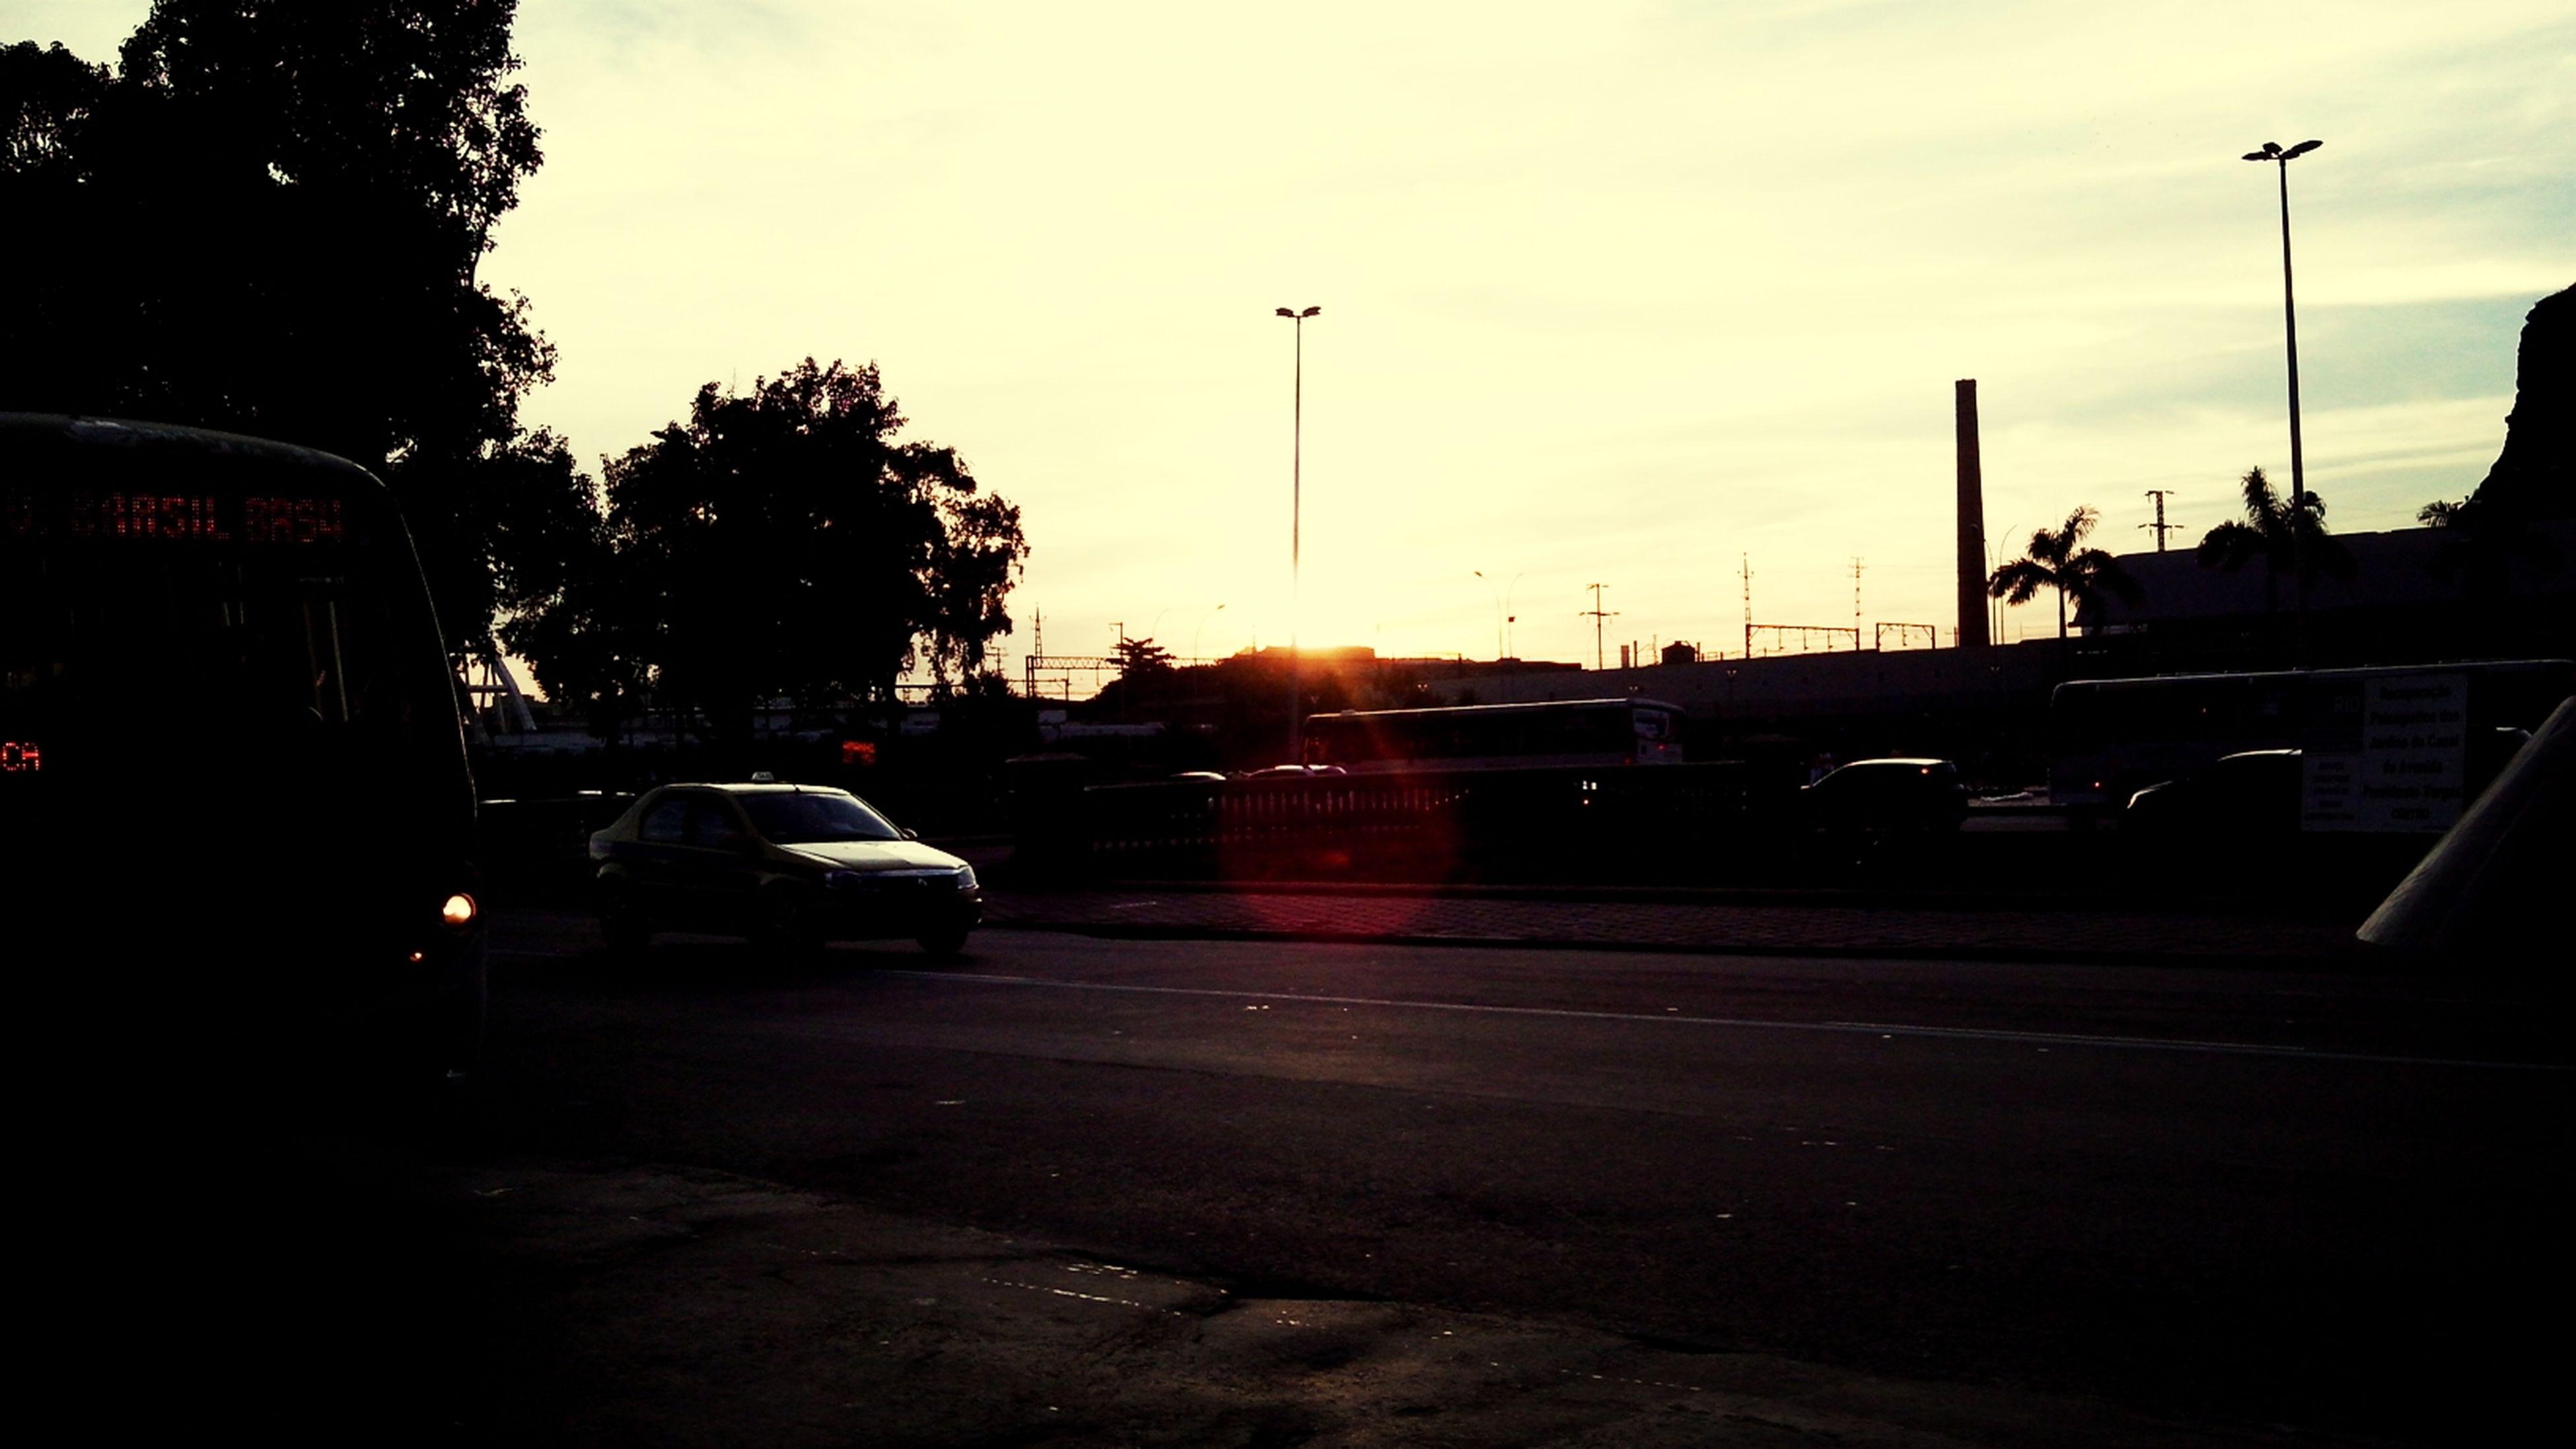 transportation, car, land vehicle, mode of transport, sunset, road, street, sky, tree, street light, silhouette, sun, the way forward, on the move, travel, traffic, sunlight, lens flare, cloud - sky, diminishing perspective